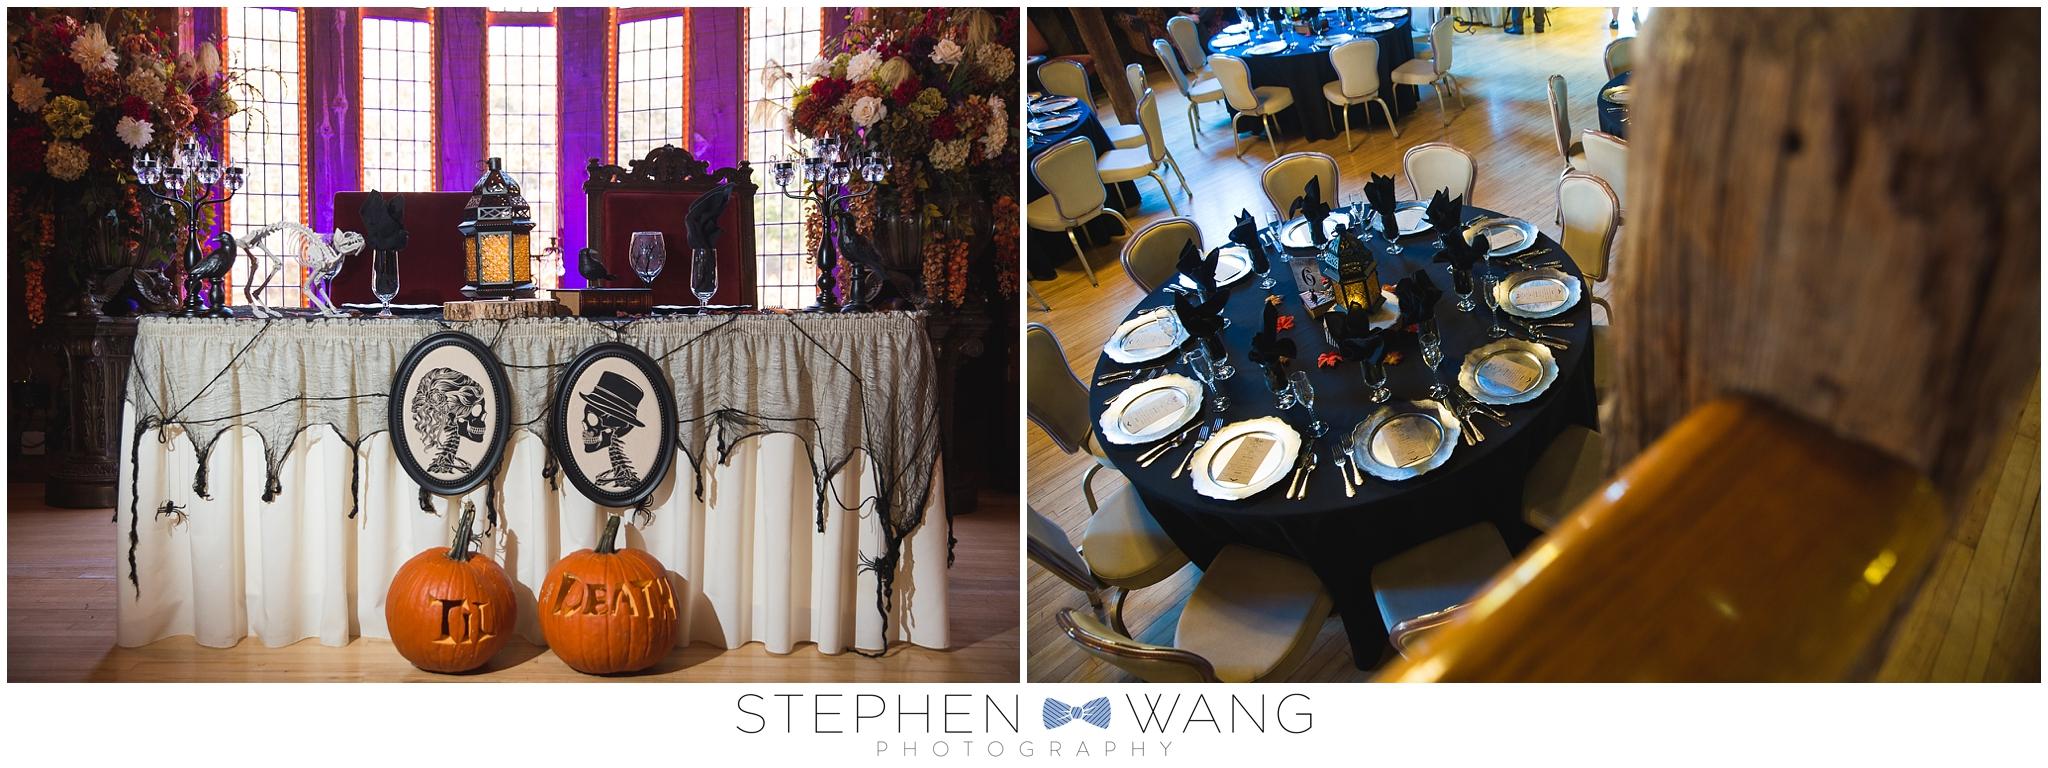 Stephen Wang Photography Wedding Connecticut CT Bill Miller's Castle Branford CT Halloween New England Wedding New Haven-12-02_0017.jpg